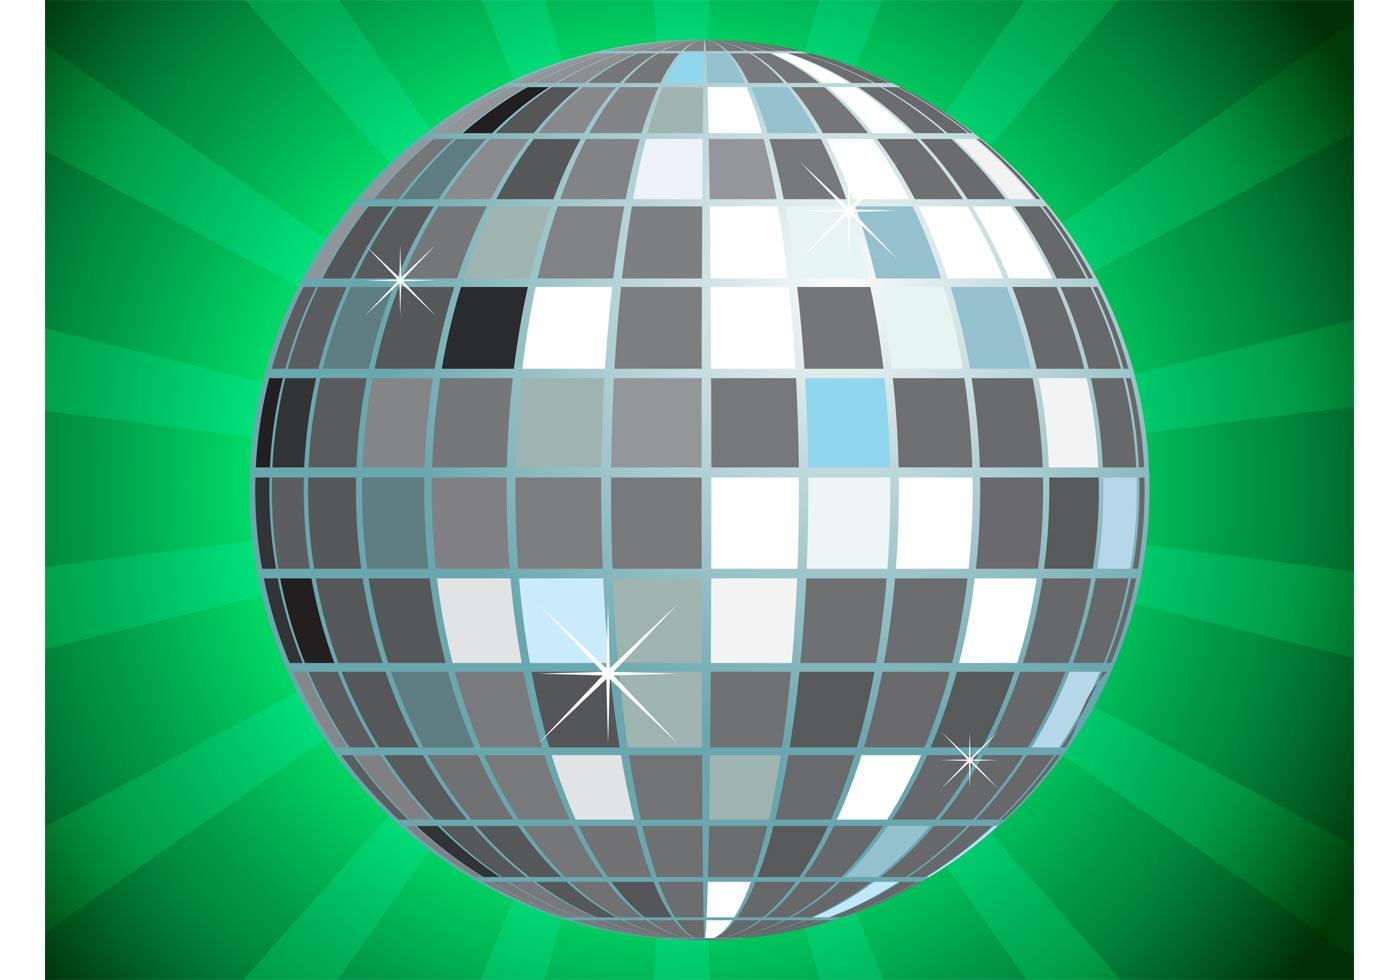 Glitter ball vector download free vector art stock - Ball image download ...